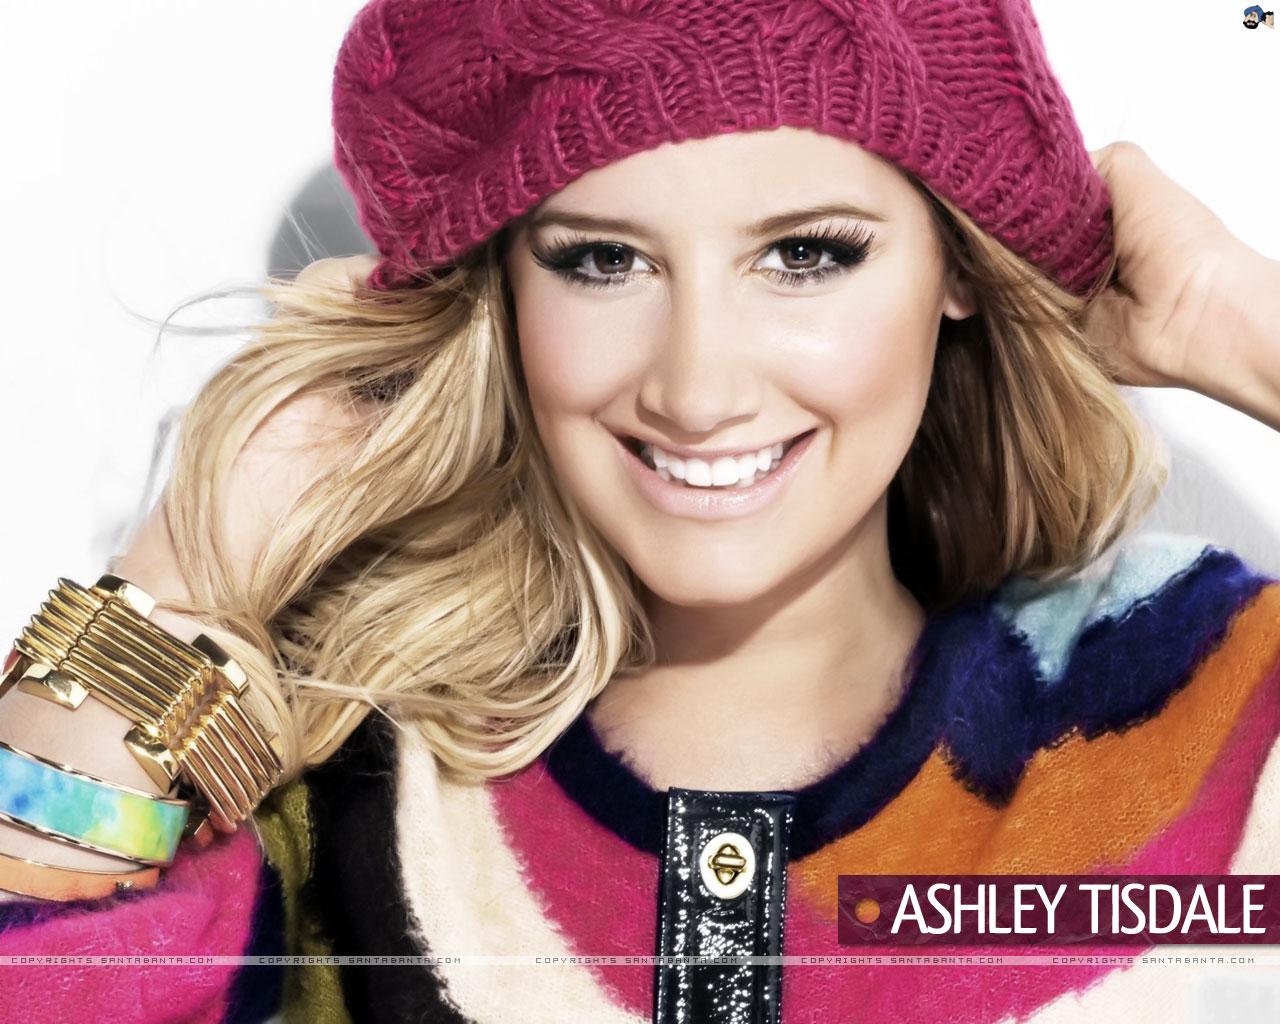 http://3.bp.blogspot.com/-z7ki8qgxJ_4/TvcWgFF8oBI/AAAAAAAAFk4/5xUoCyLDqJ4/s1600/Ashley+Tisdale+Sexy.jpg